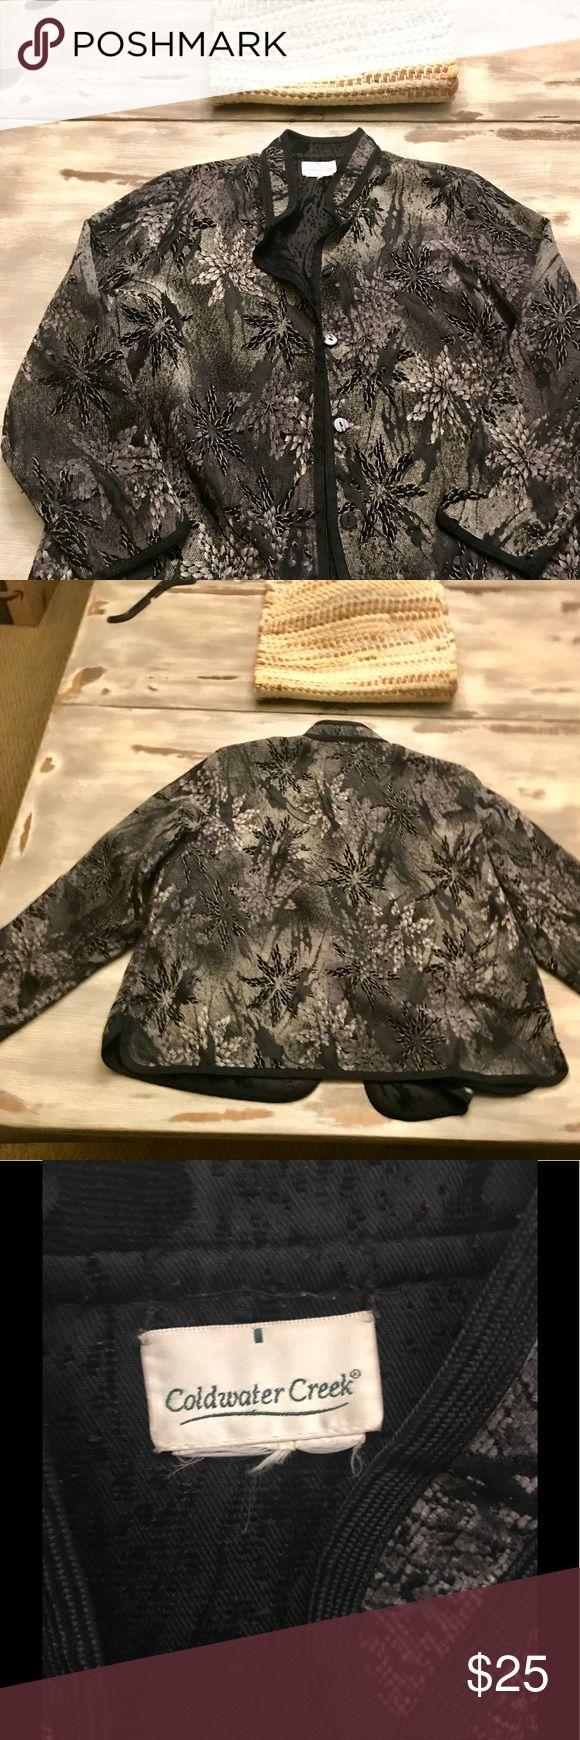 NWOT ColdWater Creek Women's Brocade Coat Brand New Women's Coldwater Creek Dark Floral Brocade Button-Up Coat Coldwater Creek Jackets & Coats